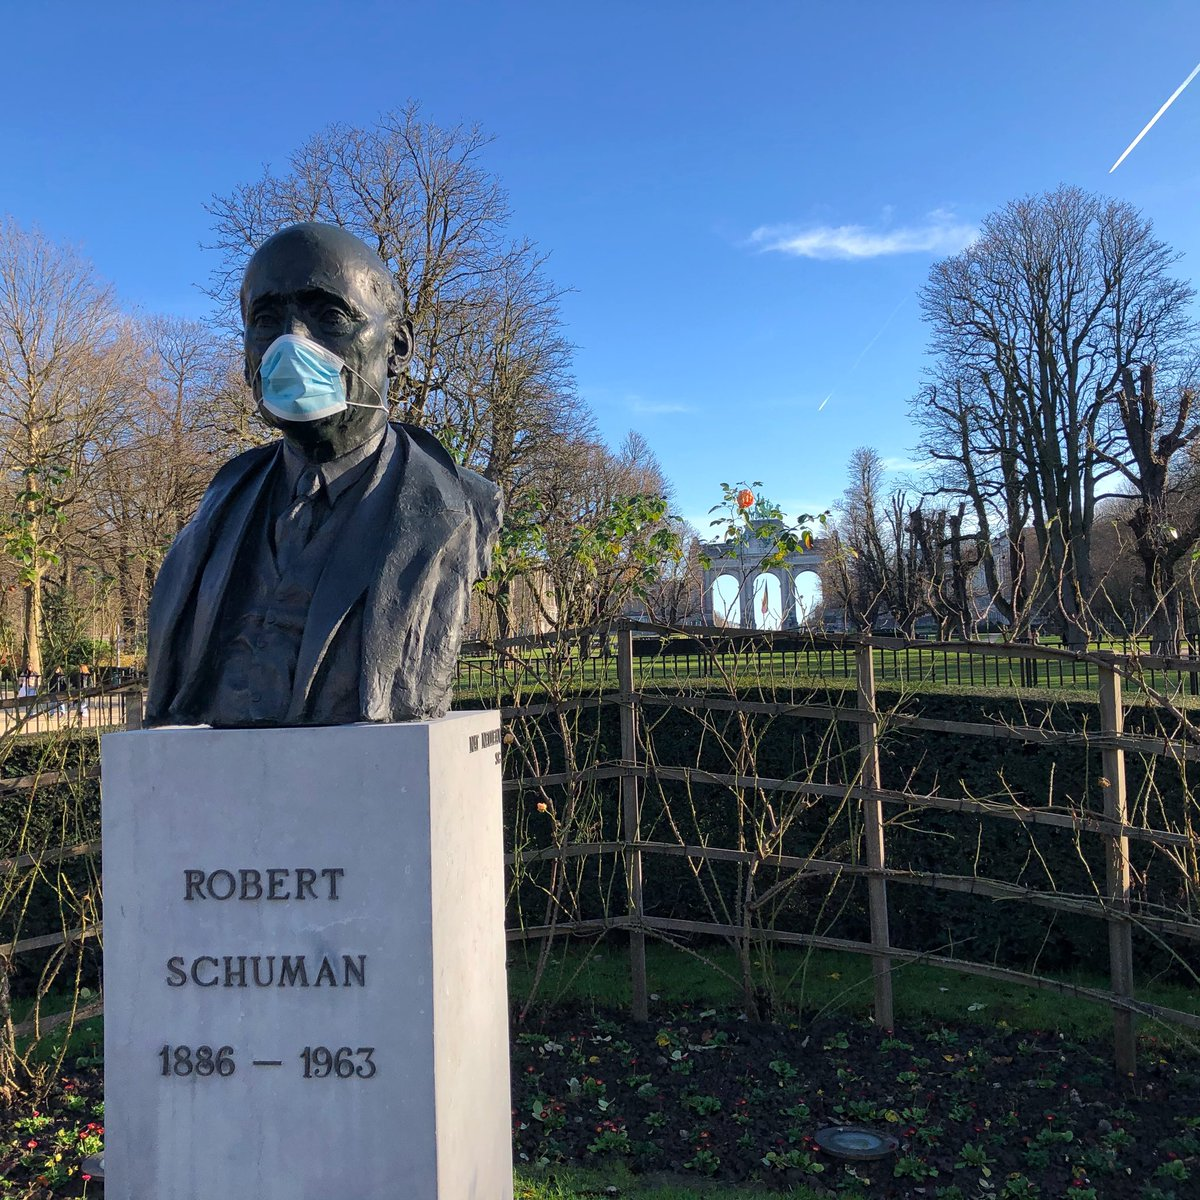 Am Ende des Jubelparks erinnert uns Robert Schuman, einer der EU…